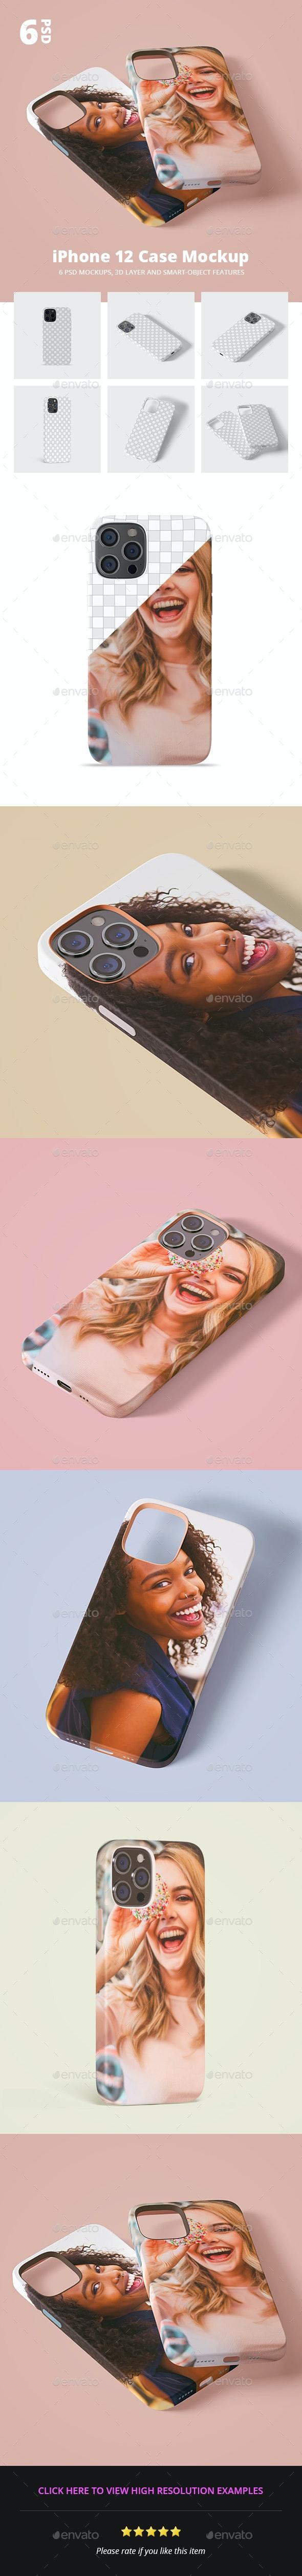 Phone 12 Case 3d Mockup - Mobile Displays